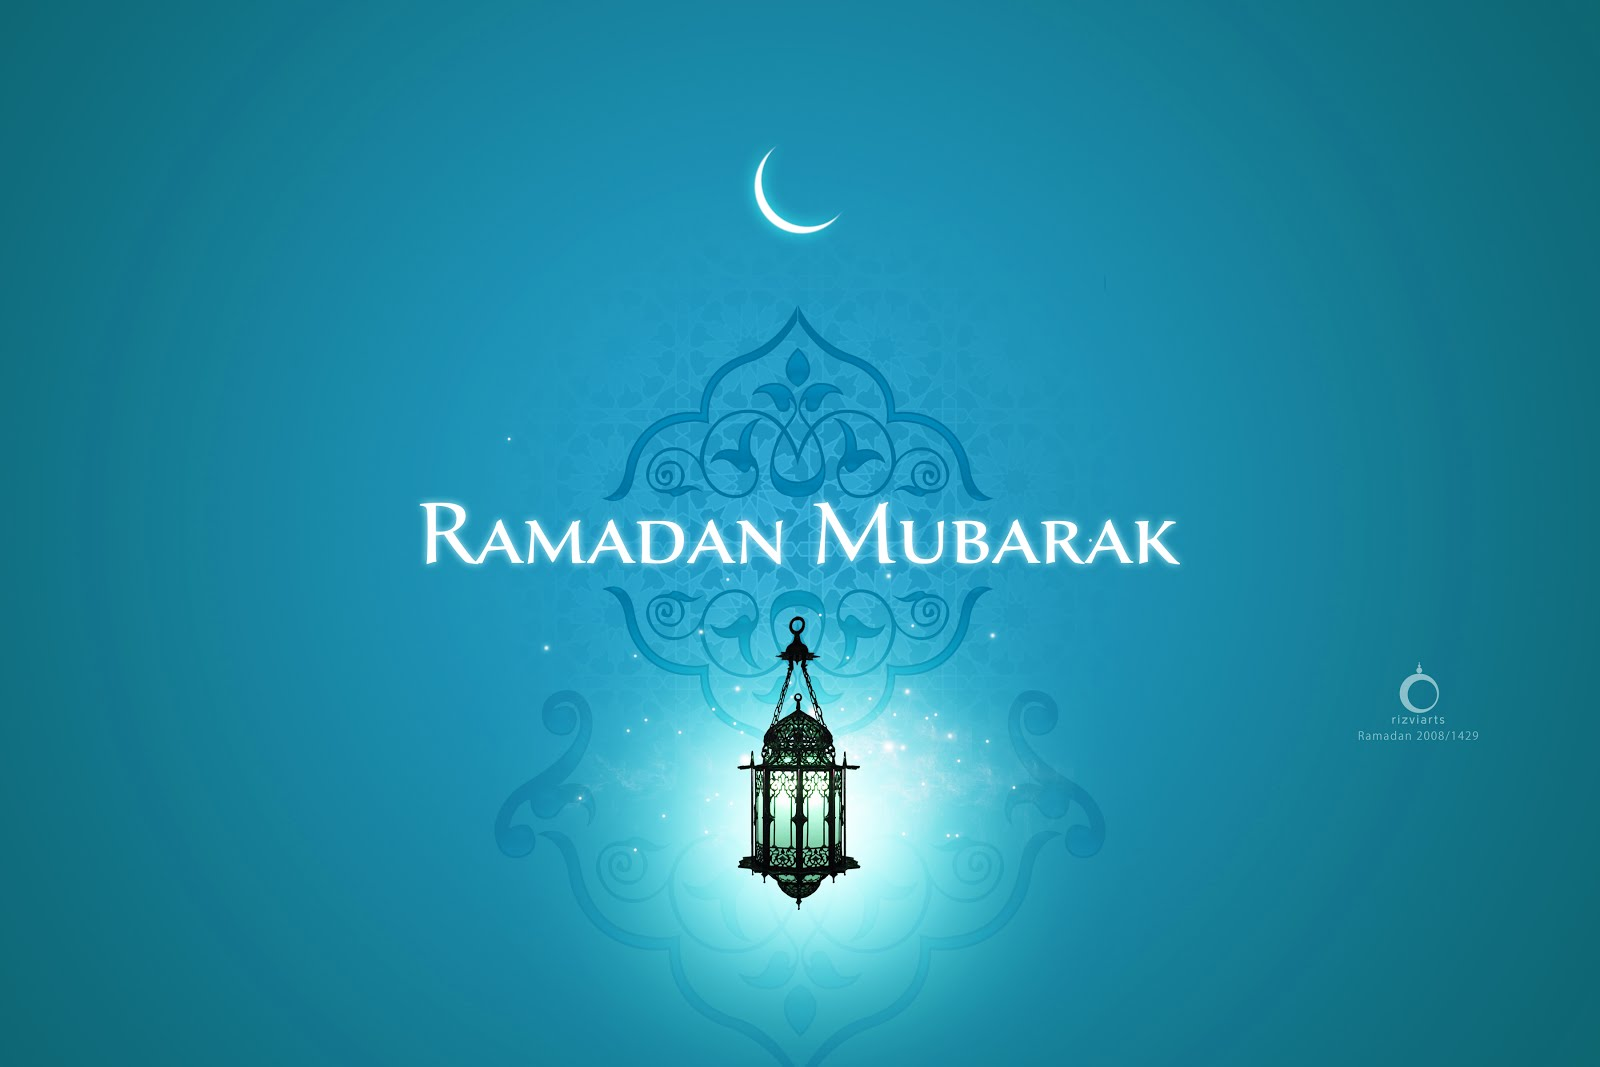 Amalan Penting Dalam Bulan Ramadhan